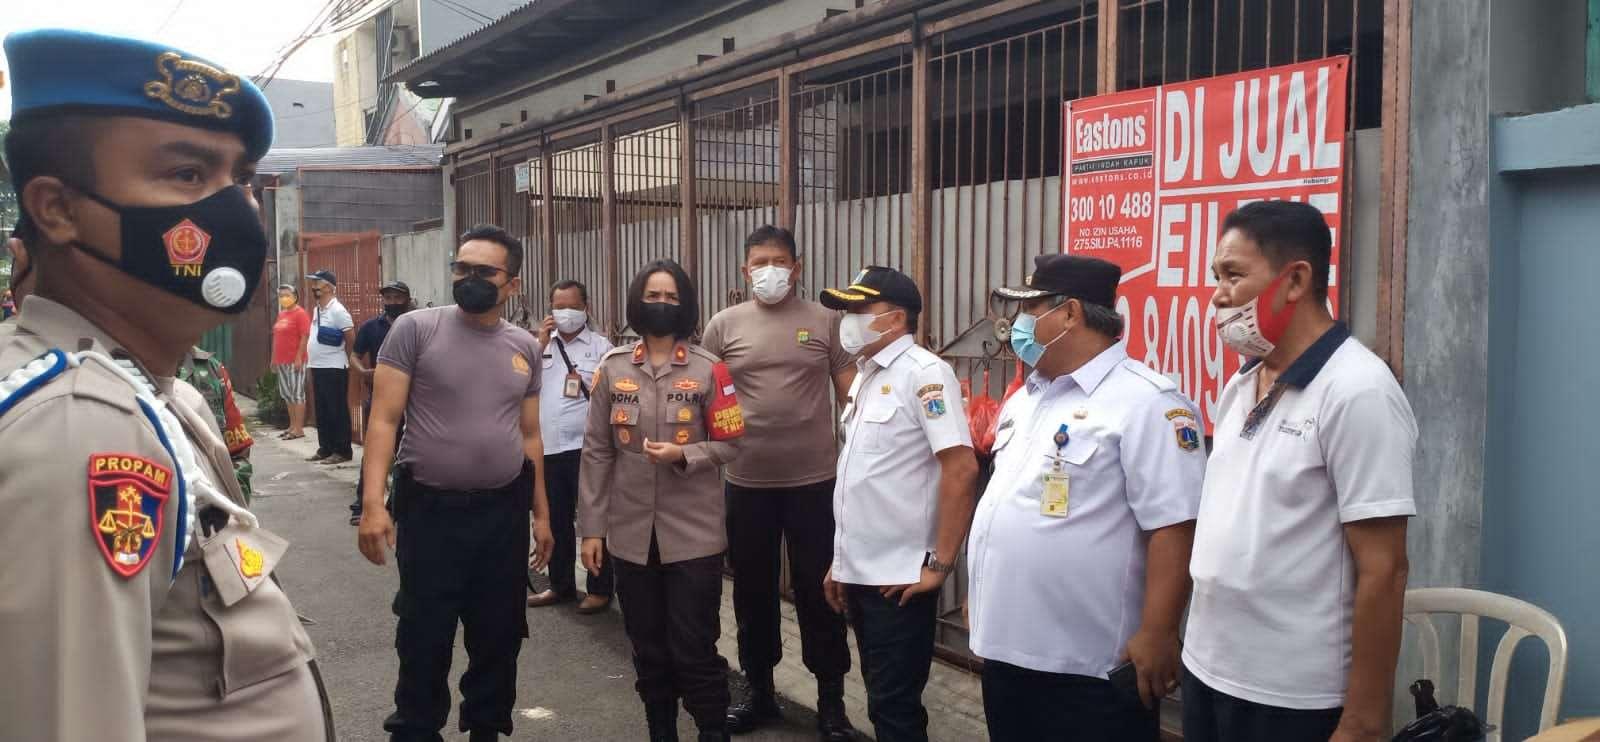 Tiga Pilar melaksanakan Apel Kerja Bakti membersihkan puing-puing di area pasca kebakaran yang terjadi di Jl.Makaliwe II Gg. 3 Rt. 03/08